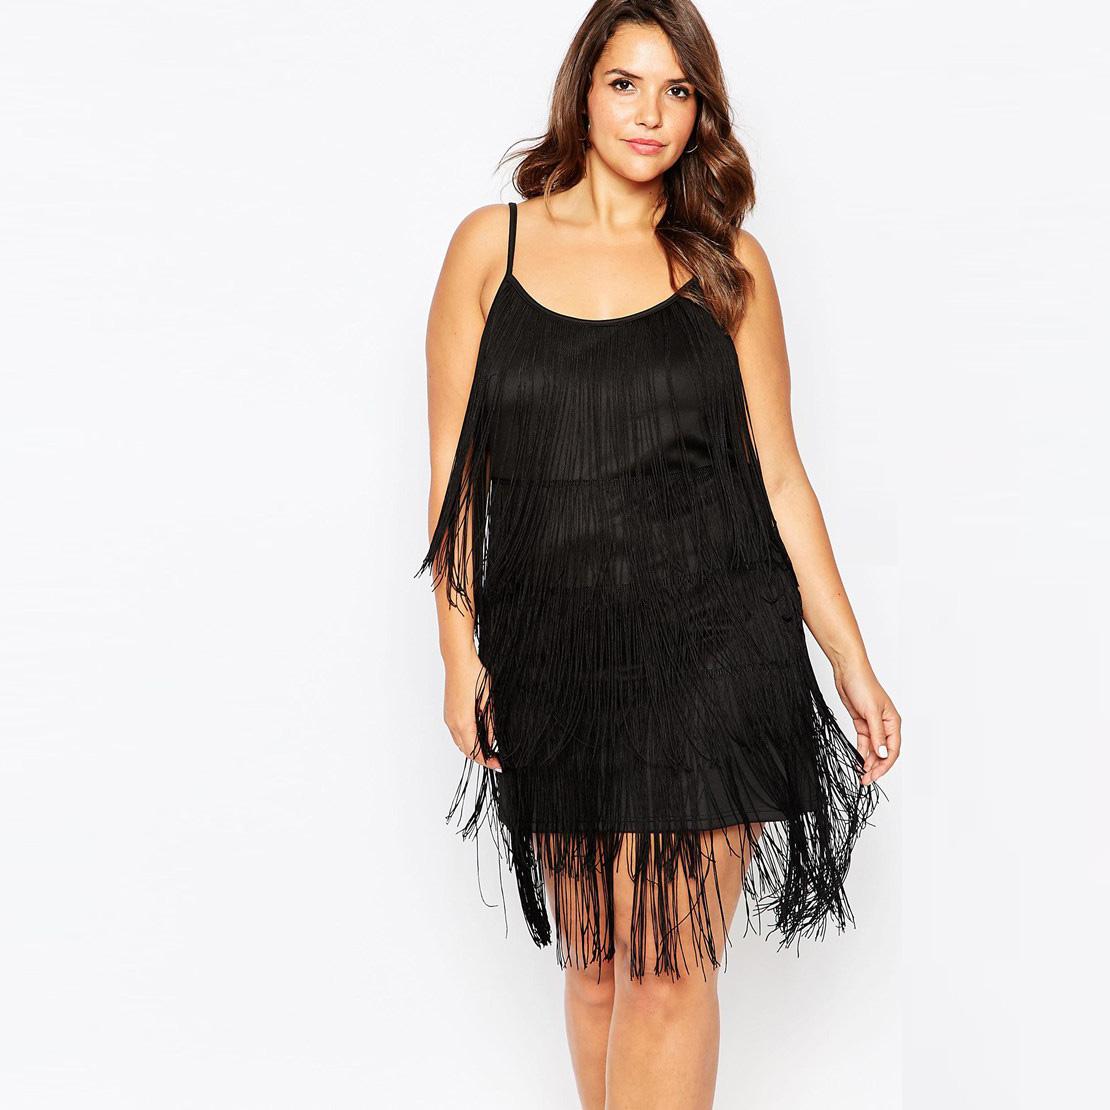 Fashion America Style Women Elegant Plus Size 5xl 4xl Xxxl Tassel Dresses Vintage O-neck Sleeveless Spaghetti Strap Club DressОдежда и ак�е��уары<br><br><br>Aliexpress